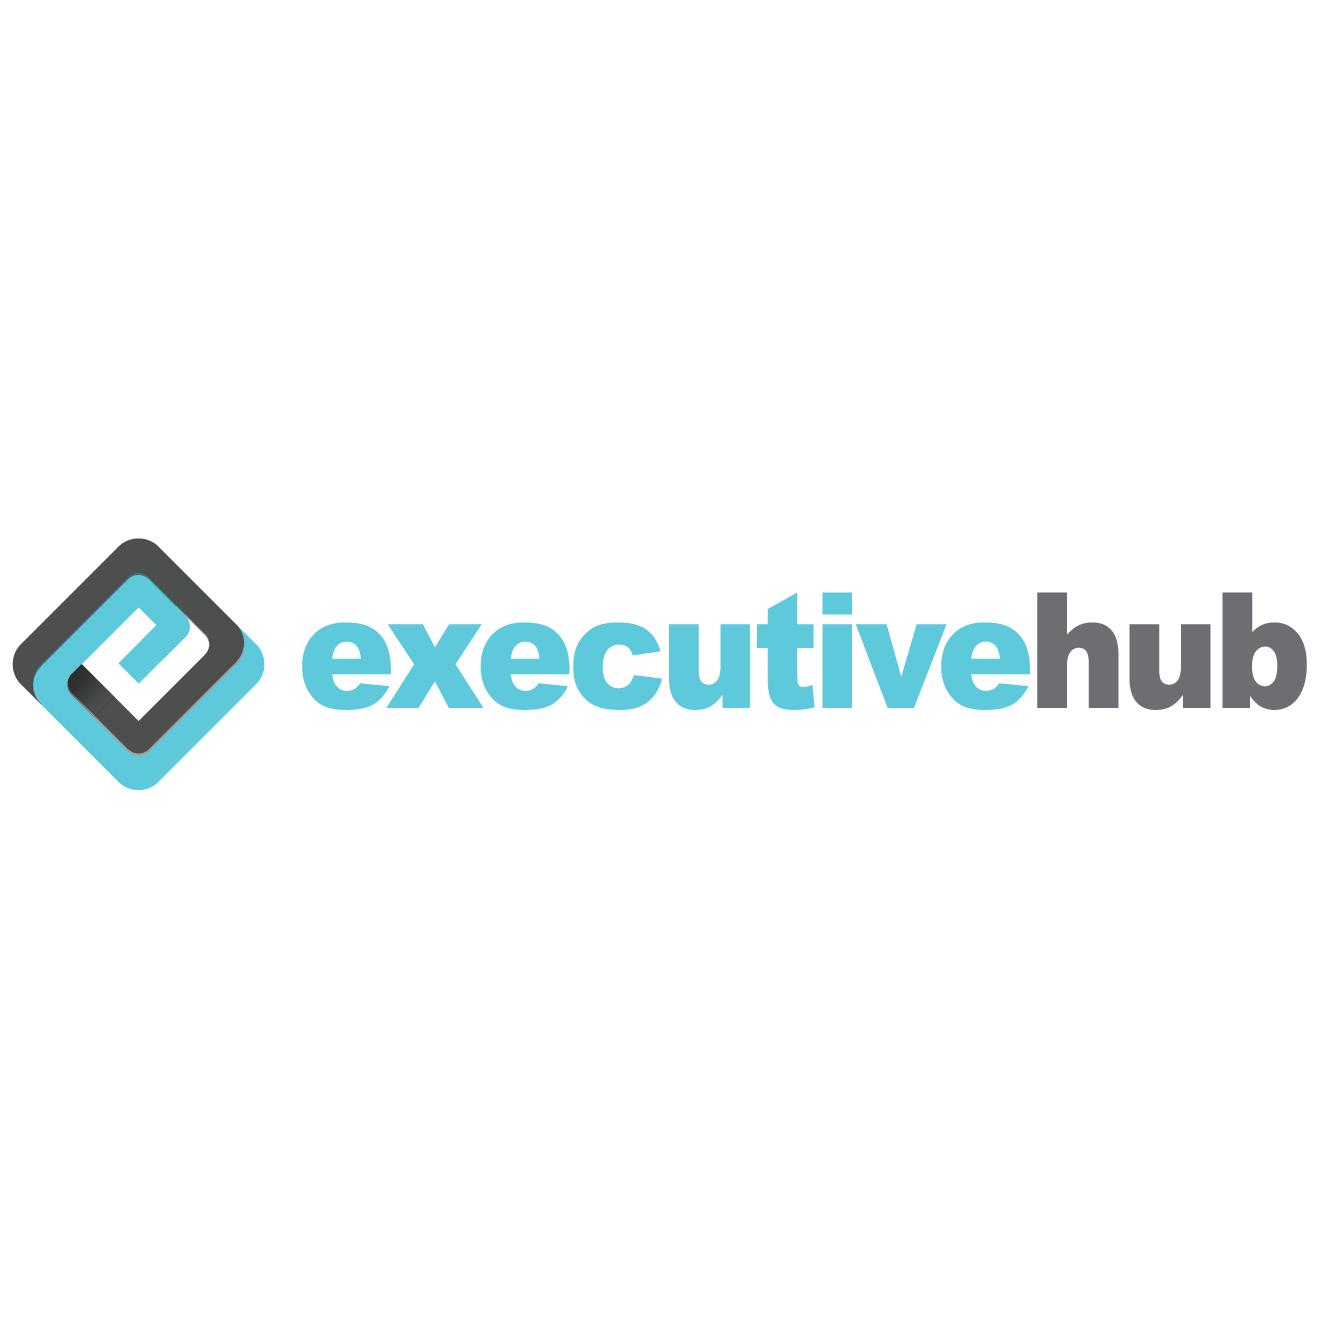 executivehub